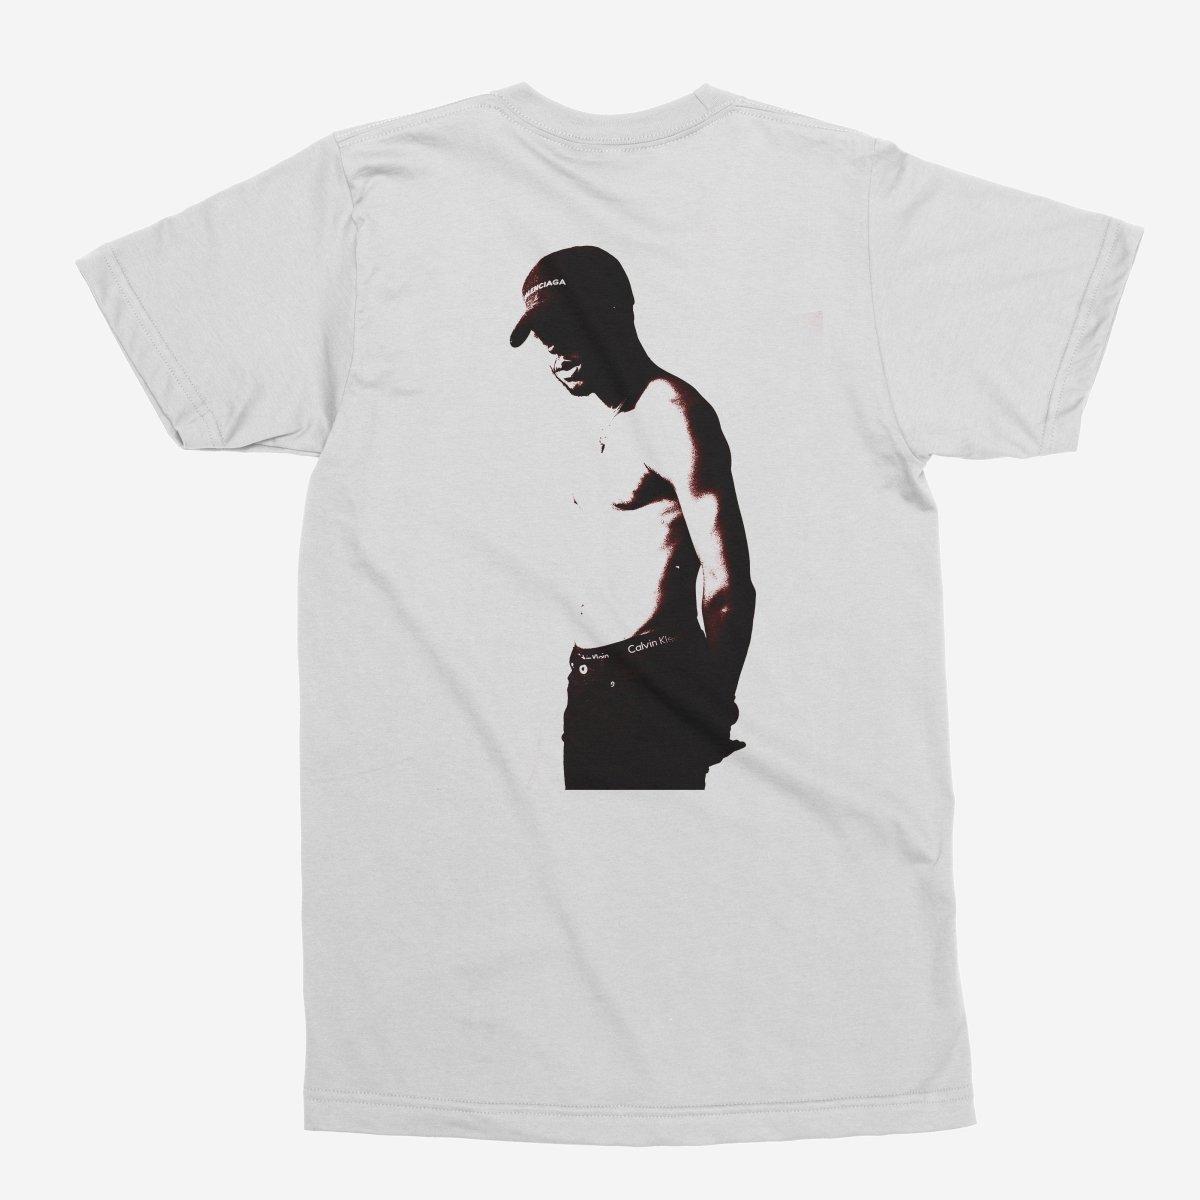 6LACK - East Atlanta Love Letter Unisex T-Shirt